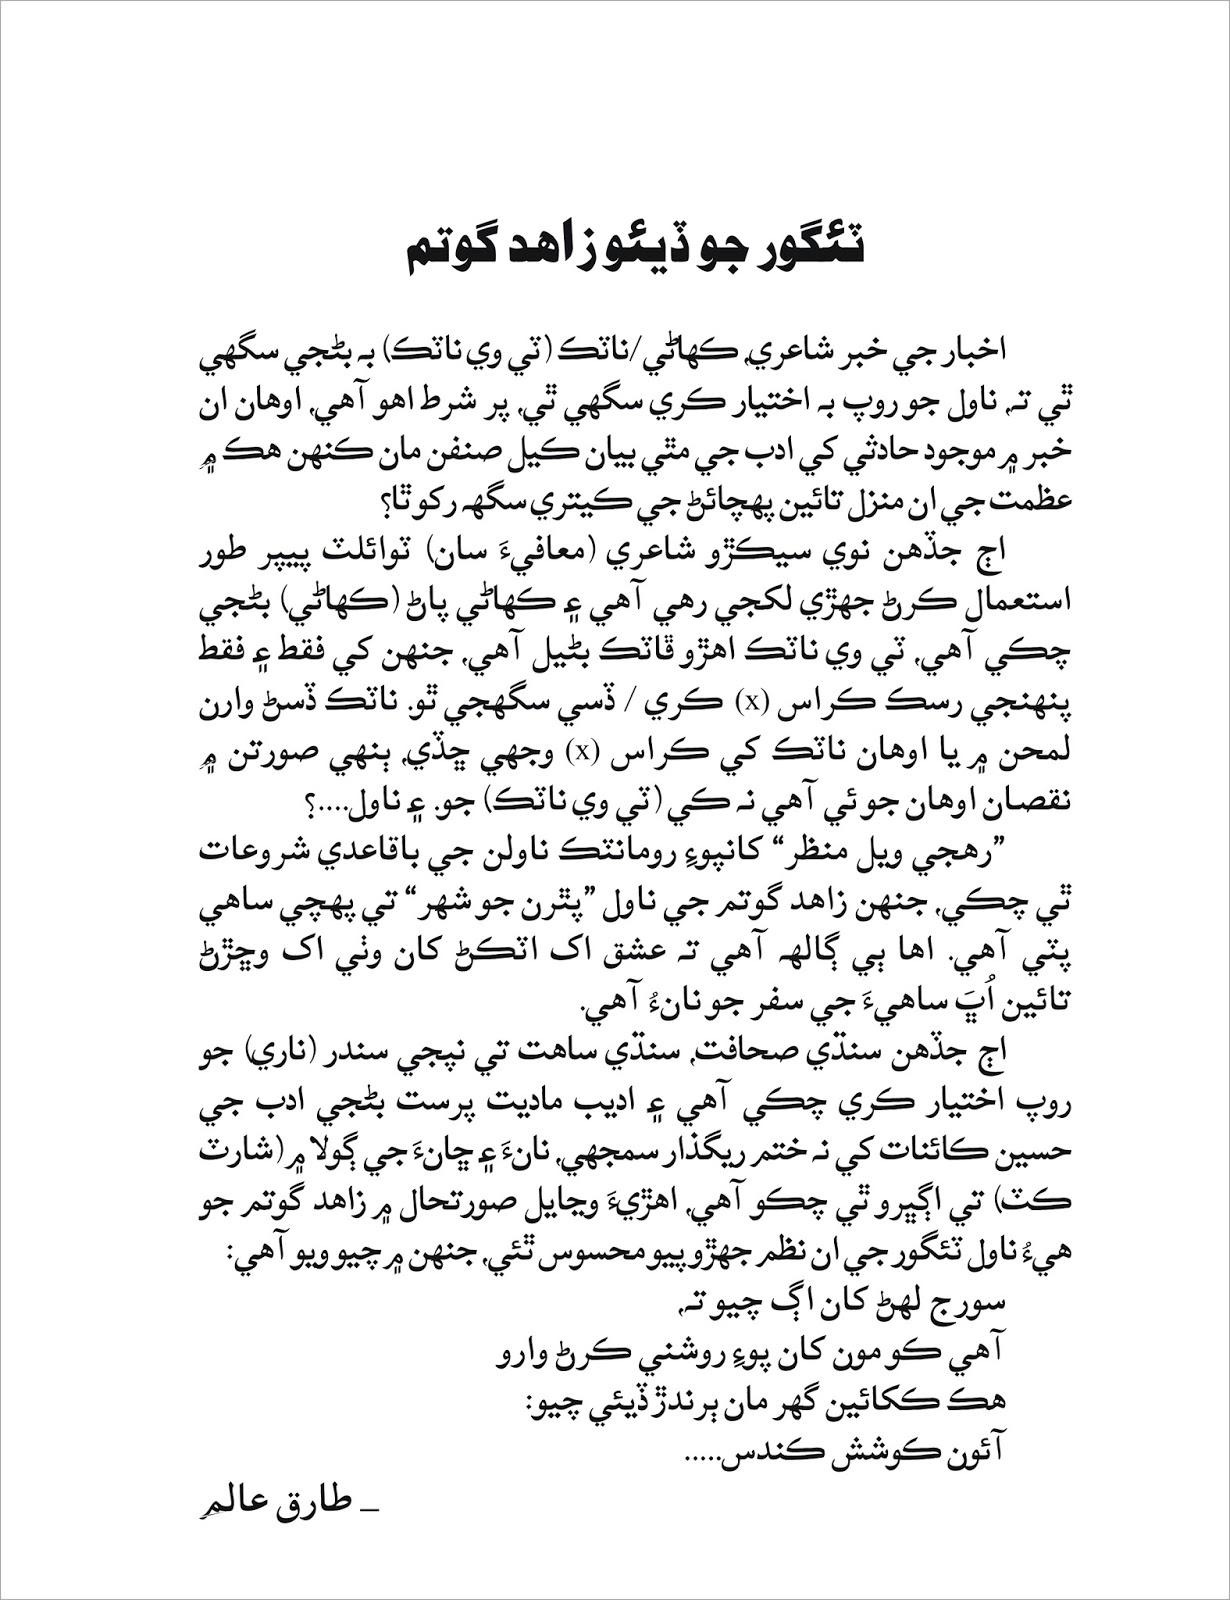 Roshni Publication: May 2016